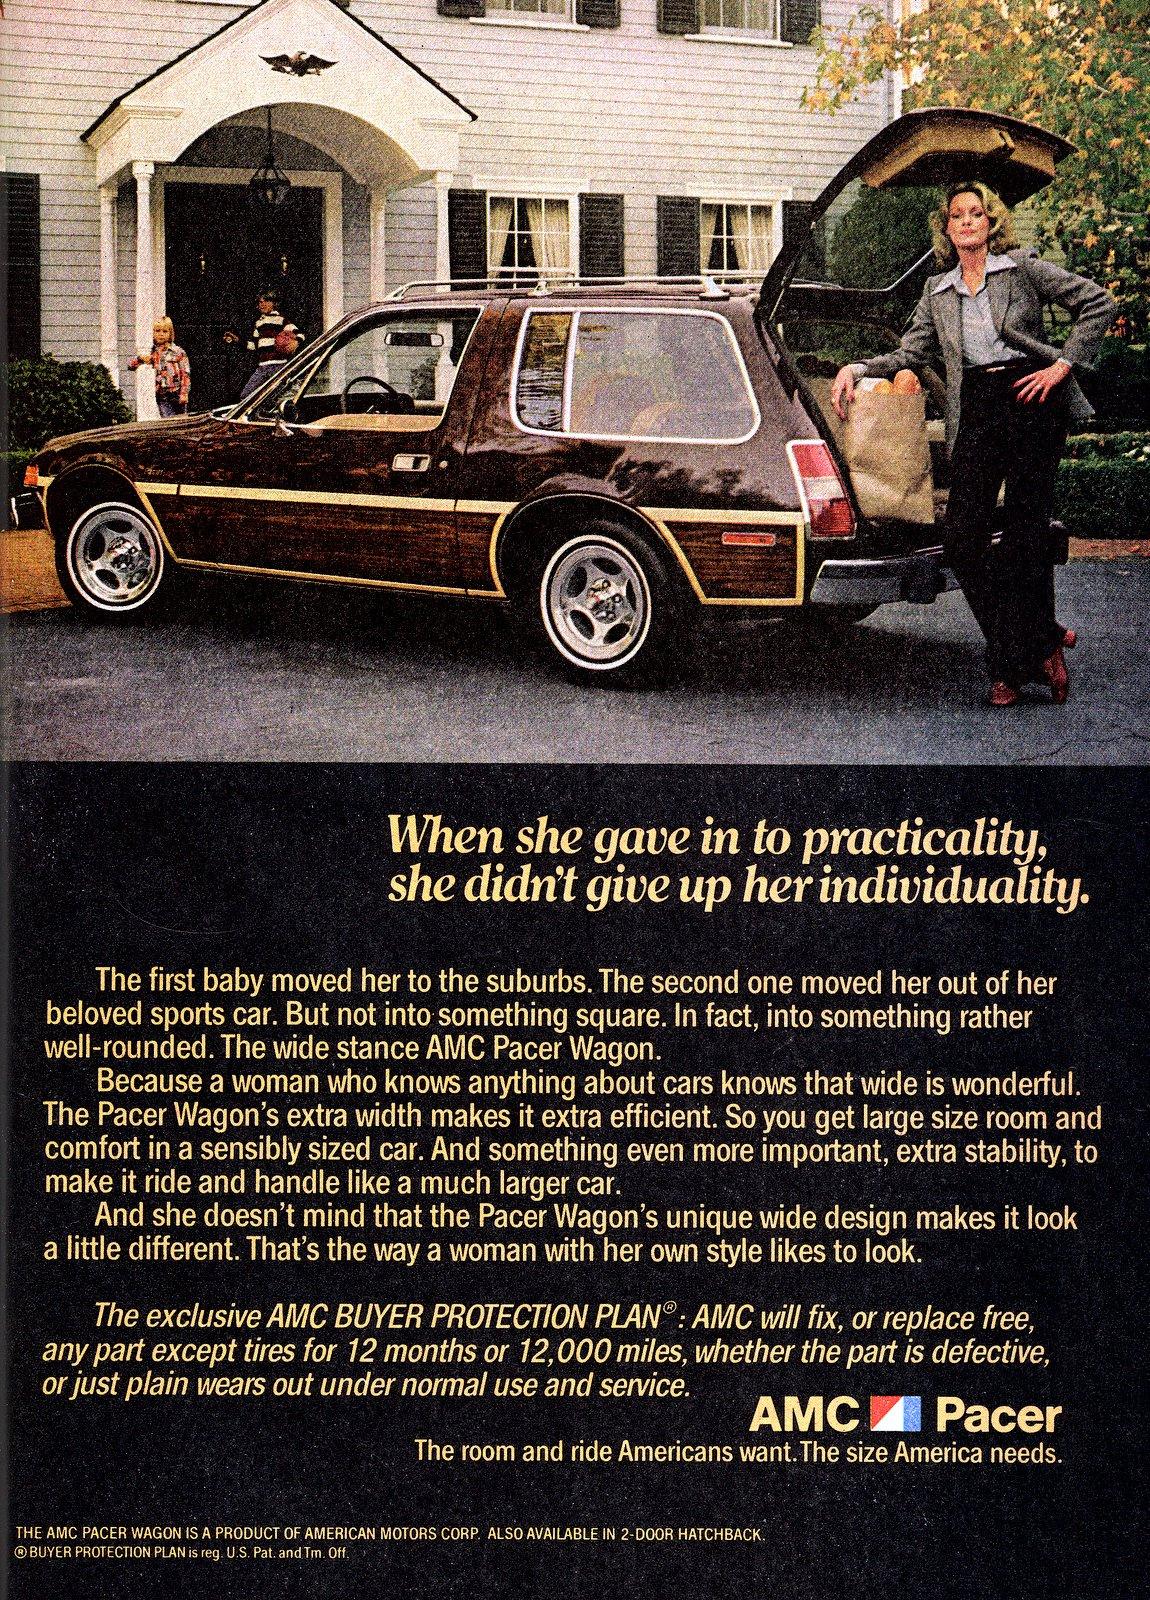 1978 AMC Pacer Wagon - American Motors